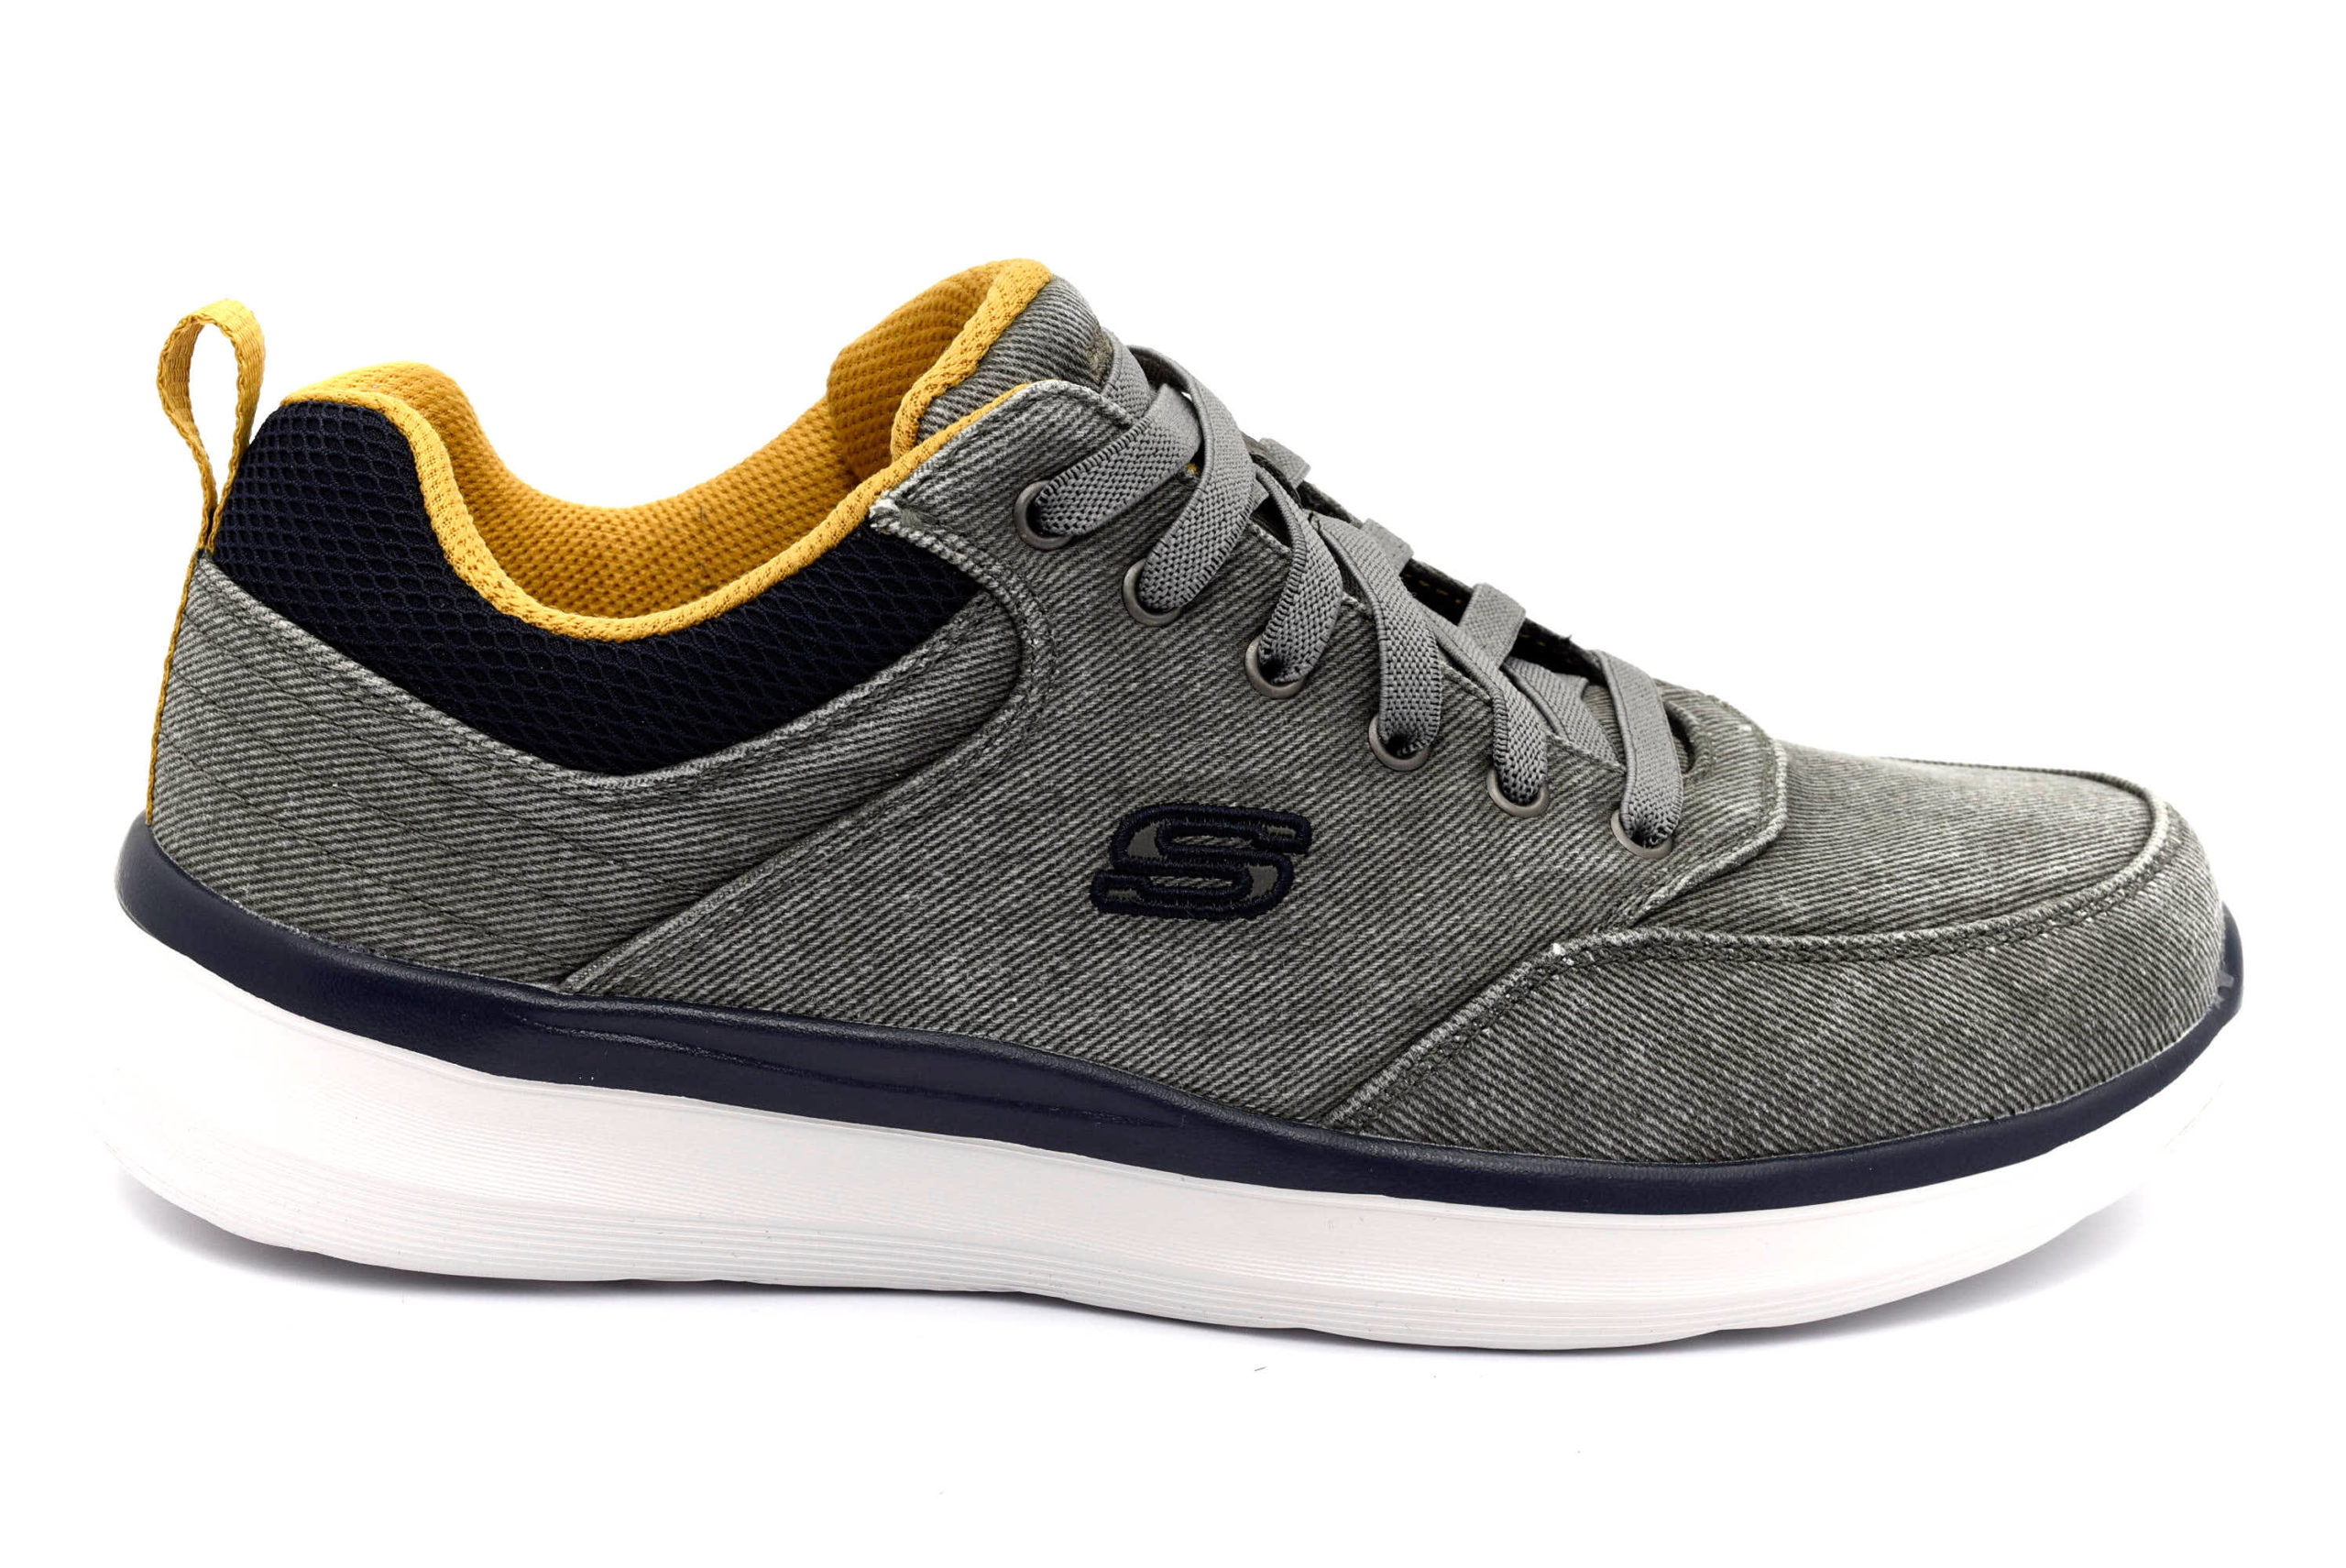 Skechers Sneaker uomo grigia in pelle e tessuto Sneakers